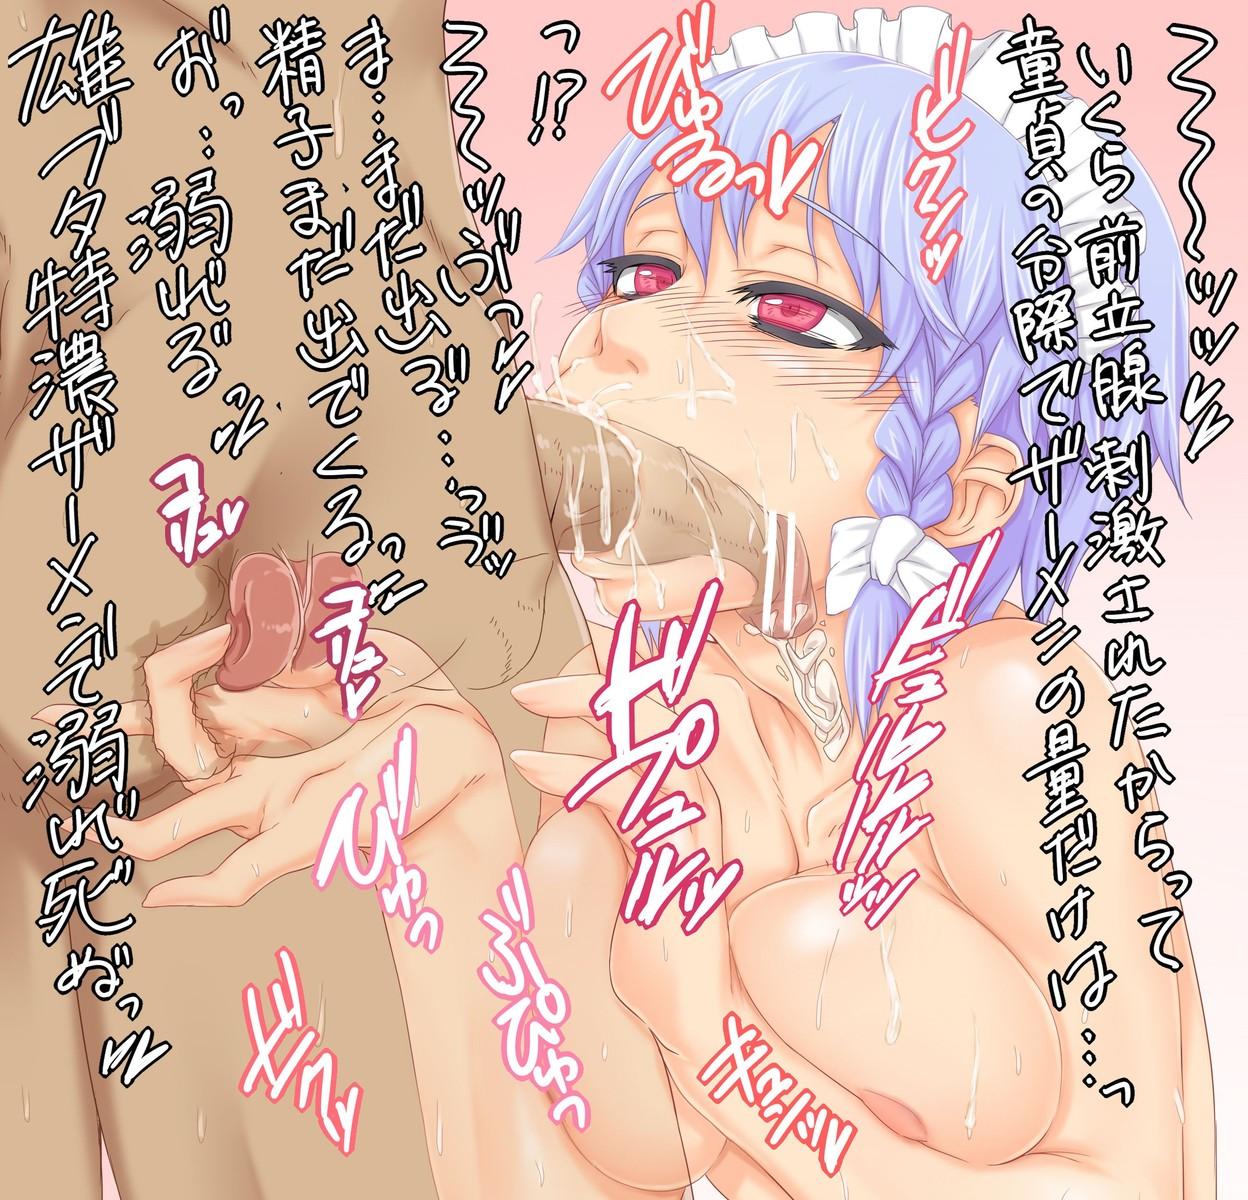 prostate_milking008